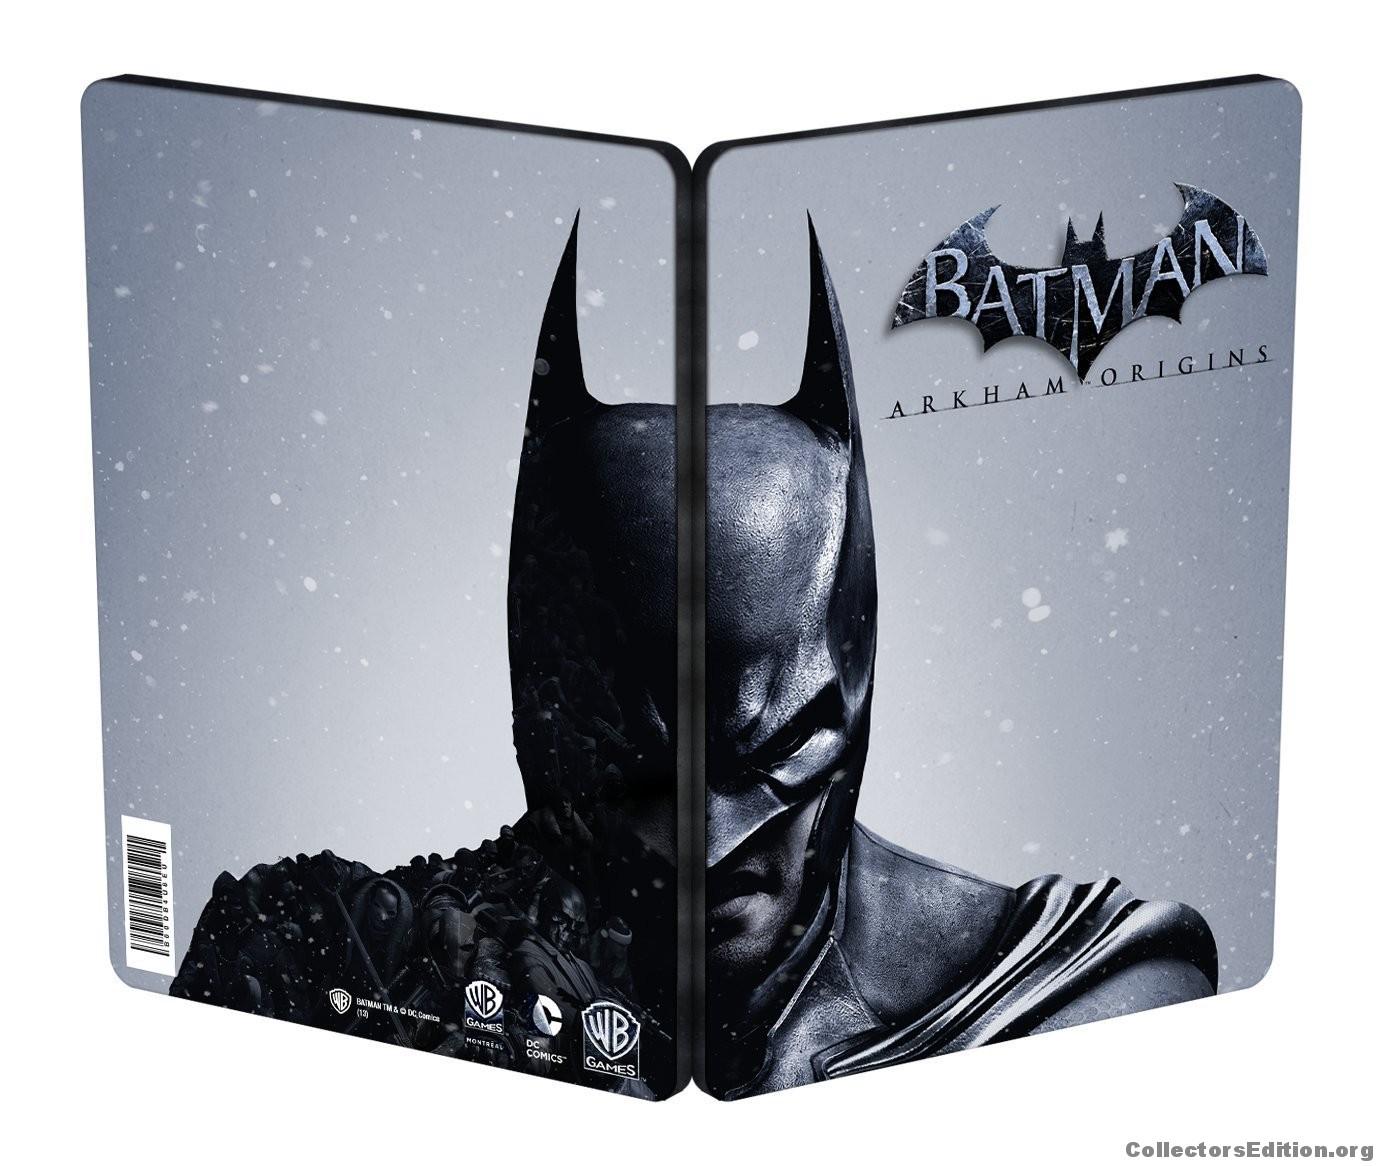 Batman Arkham Origins The Complete Edition Steelbook - PlayStation 3 Játékok